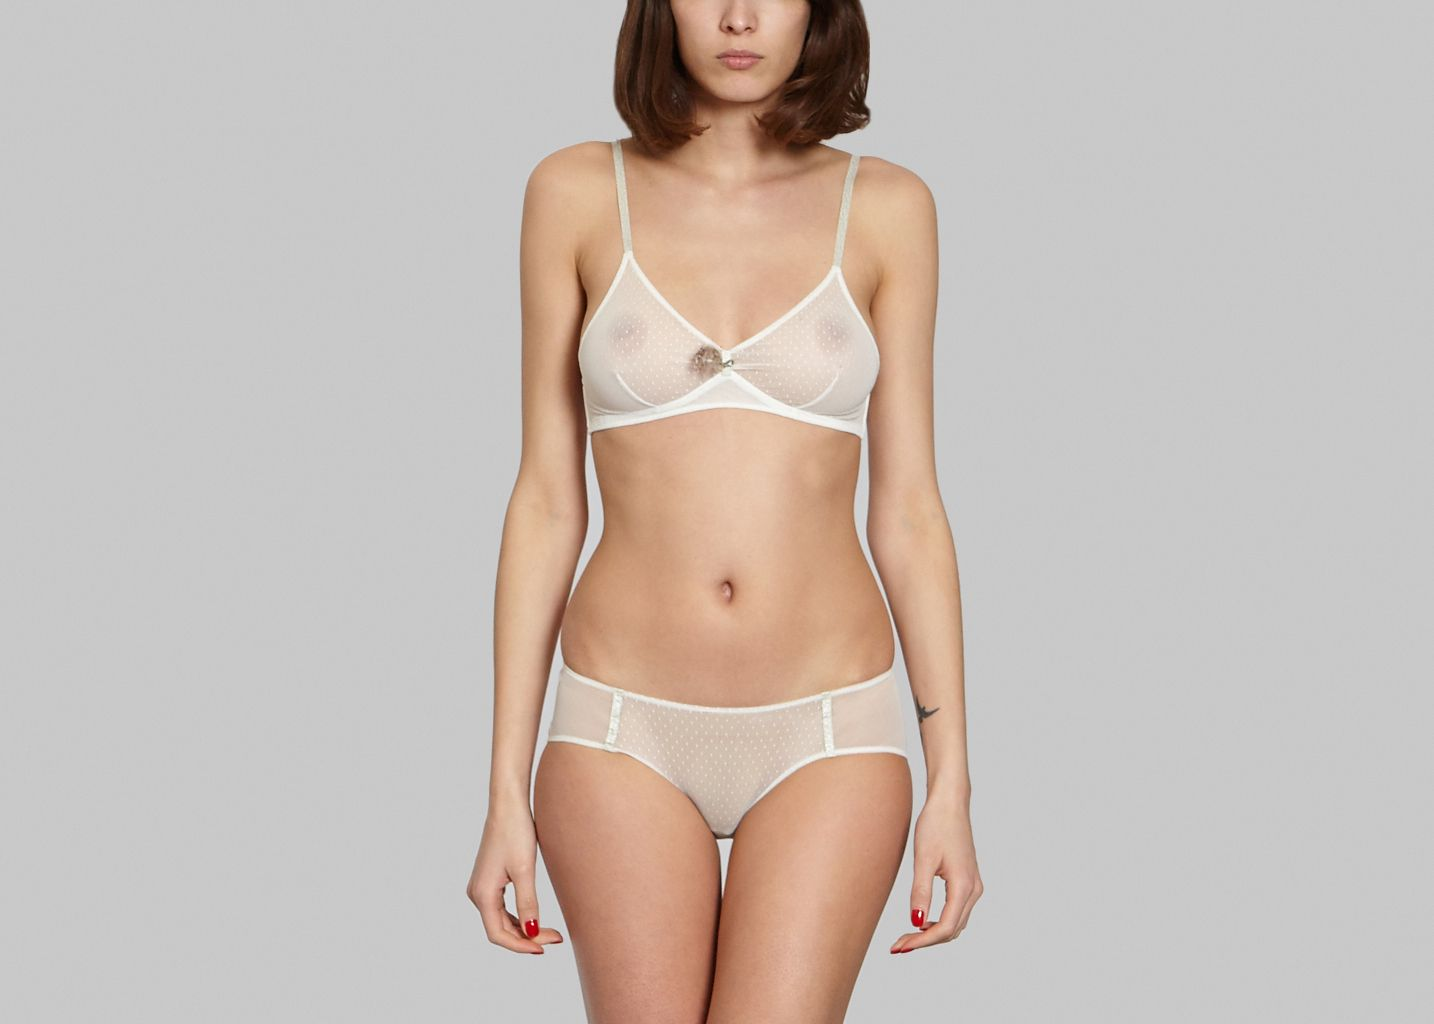 Soutien-Gorge Eva - Velvette Underwear